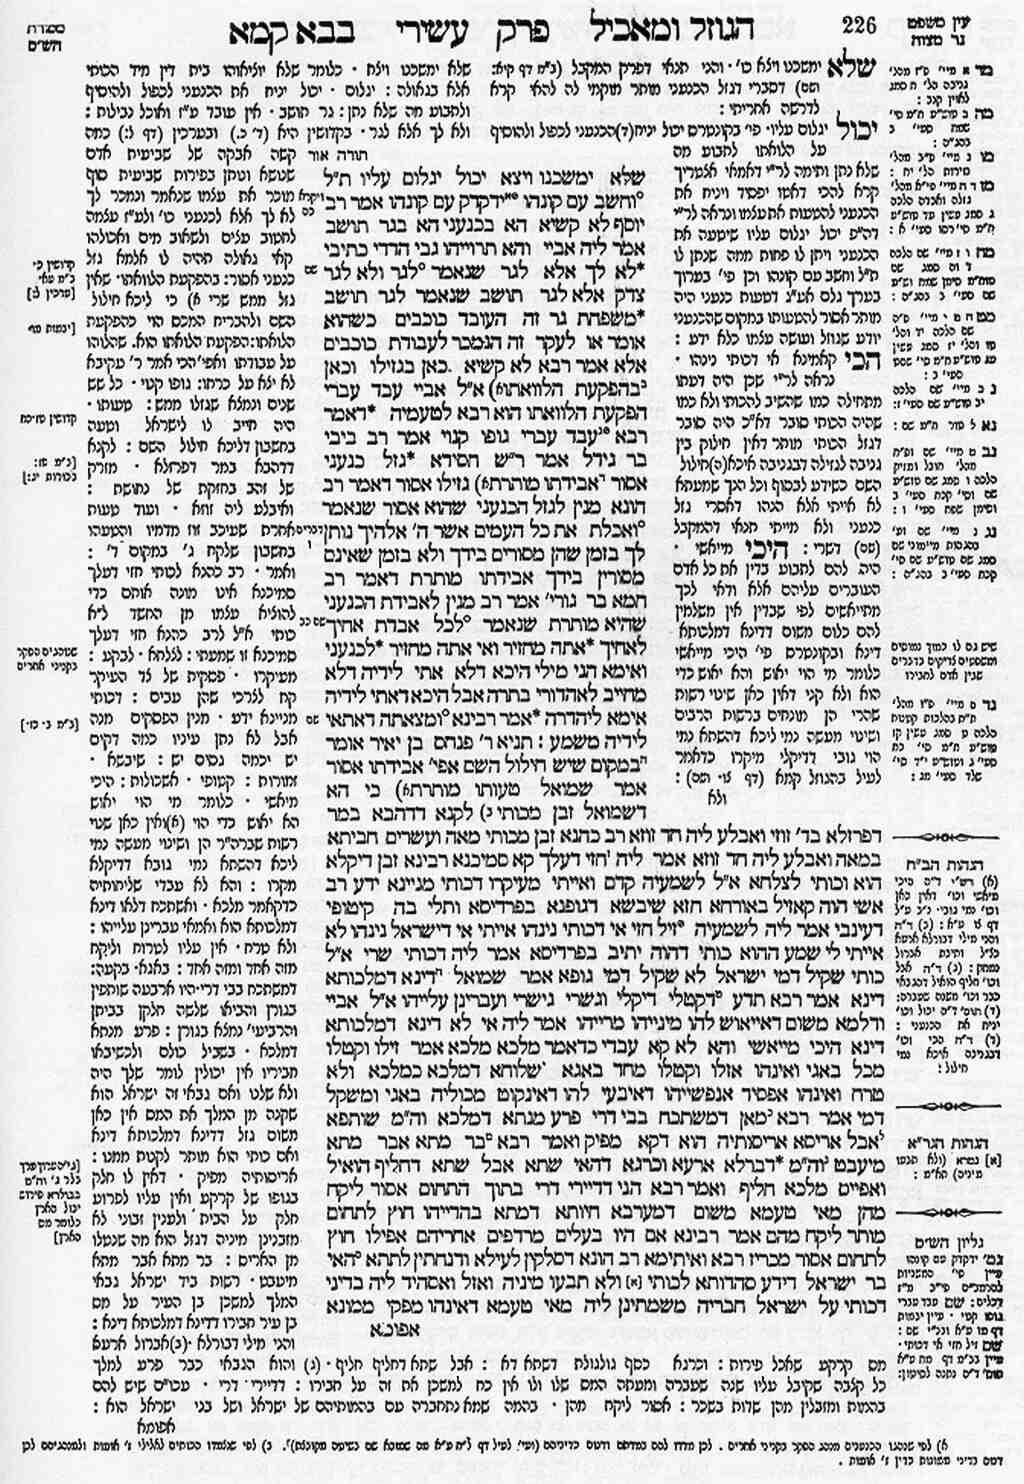 Talmud Bavli, Traktat Bava Kamma, Folio 113b